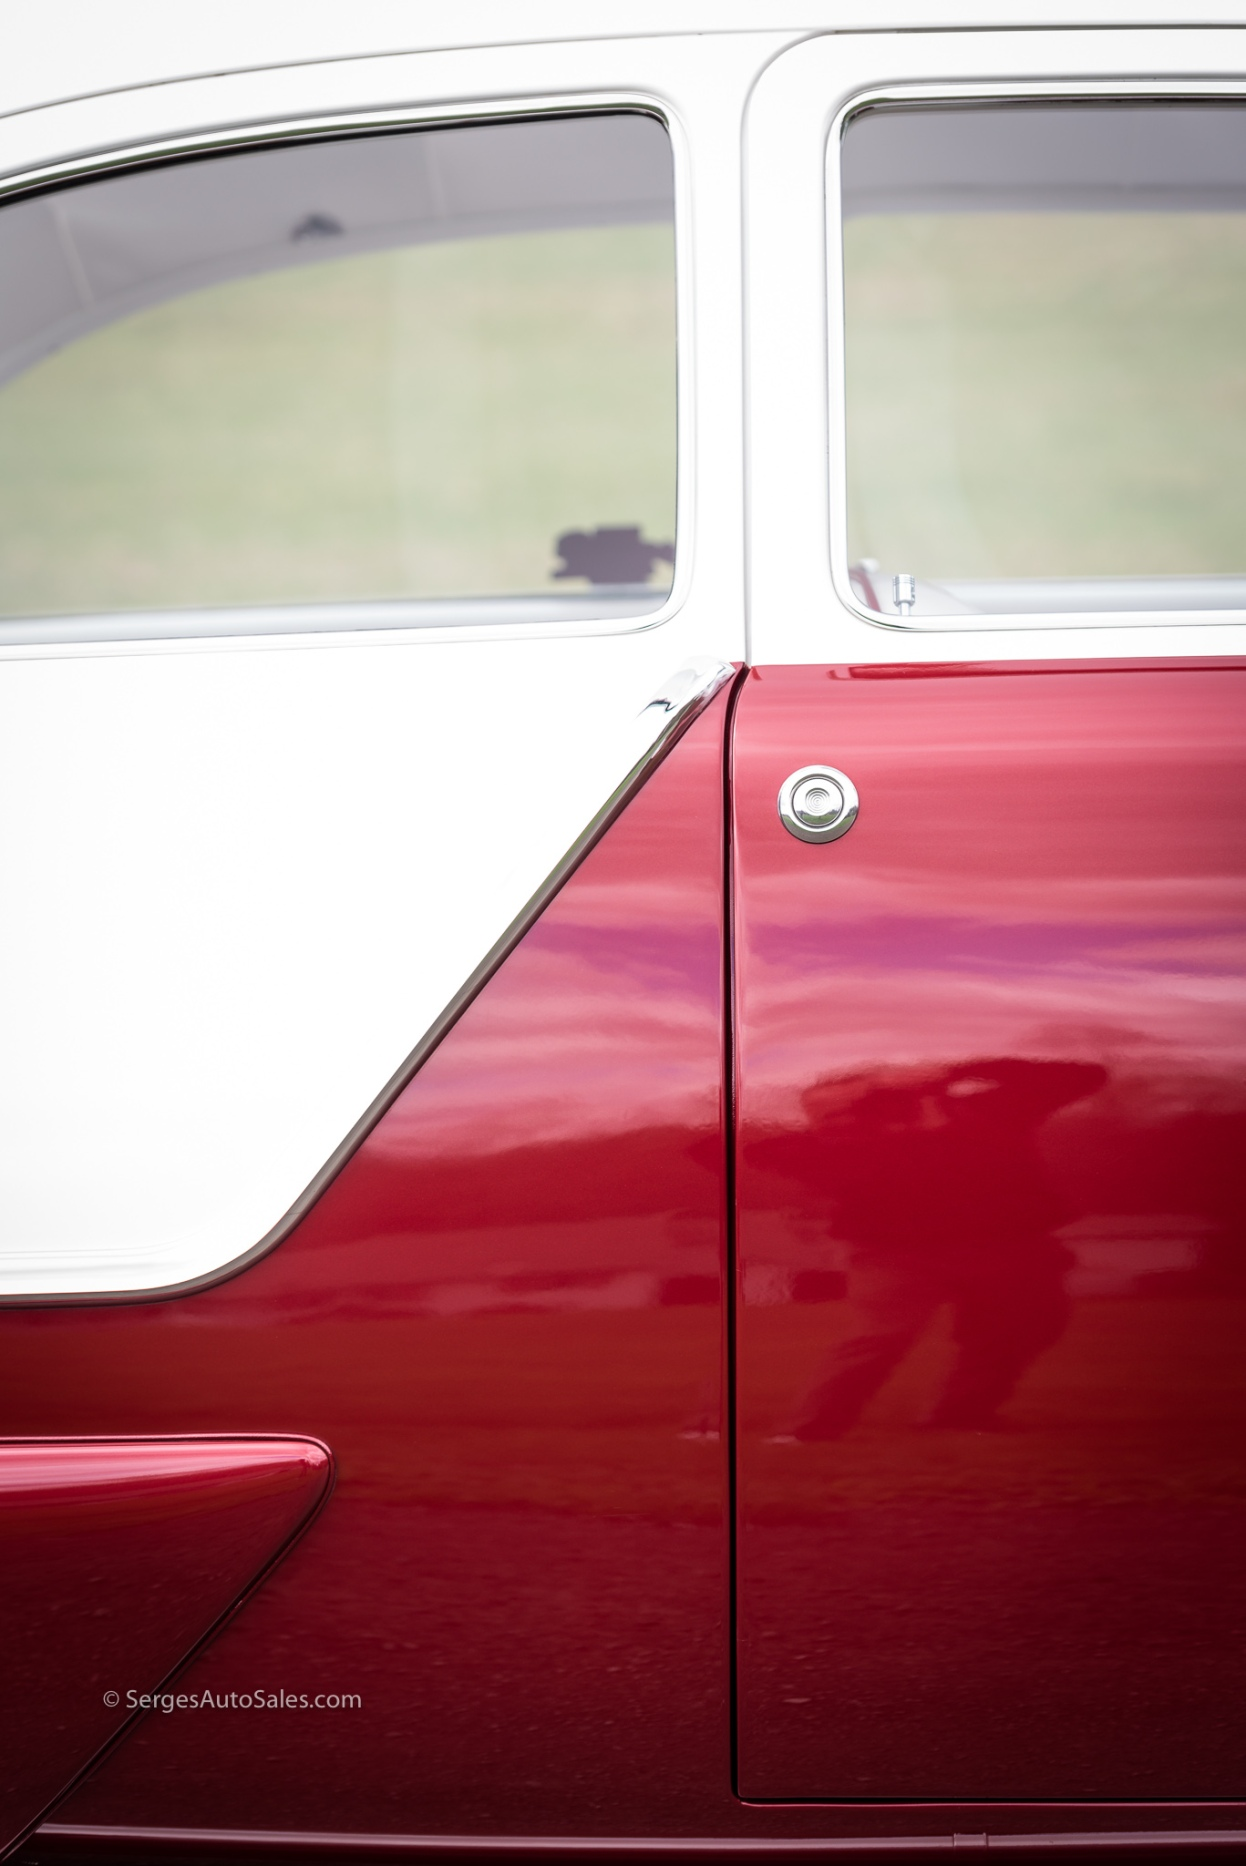 1950-ford-custom-for-sale-serges-auto-sales-pennsylvania-car-dealer-classics-customs-muscle-brokering-45